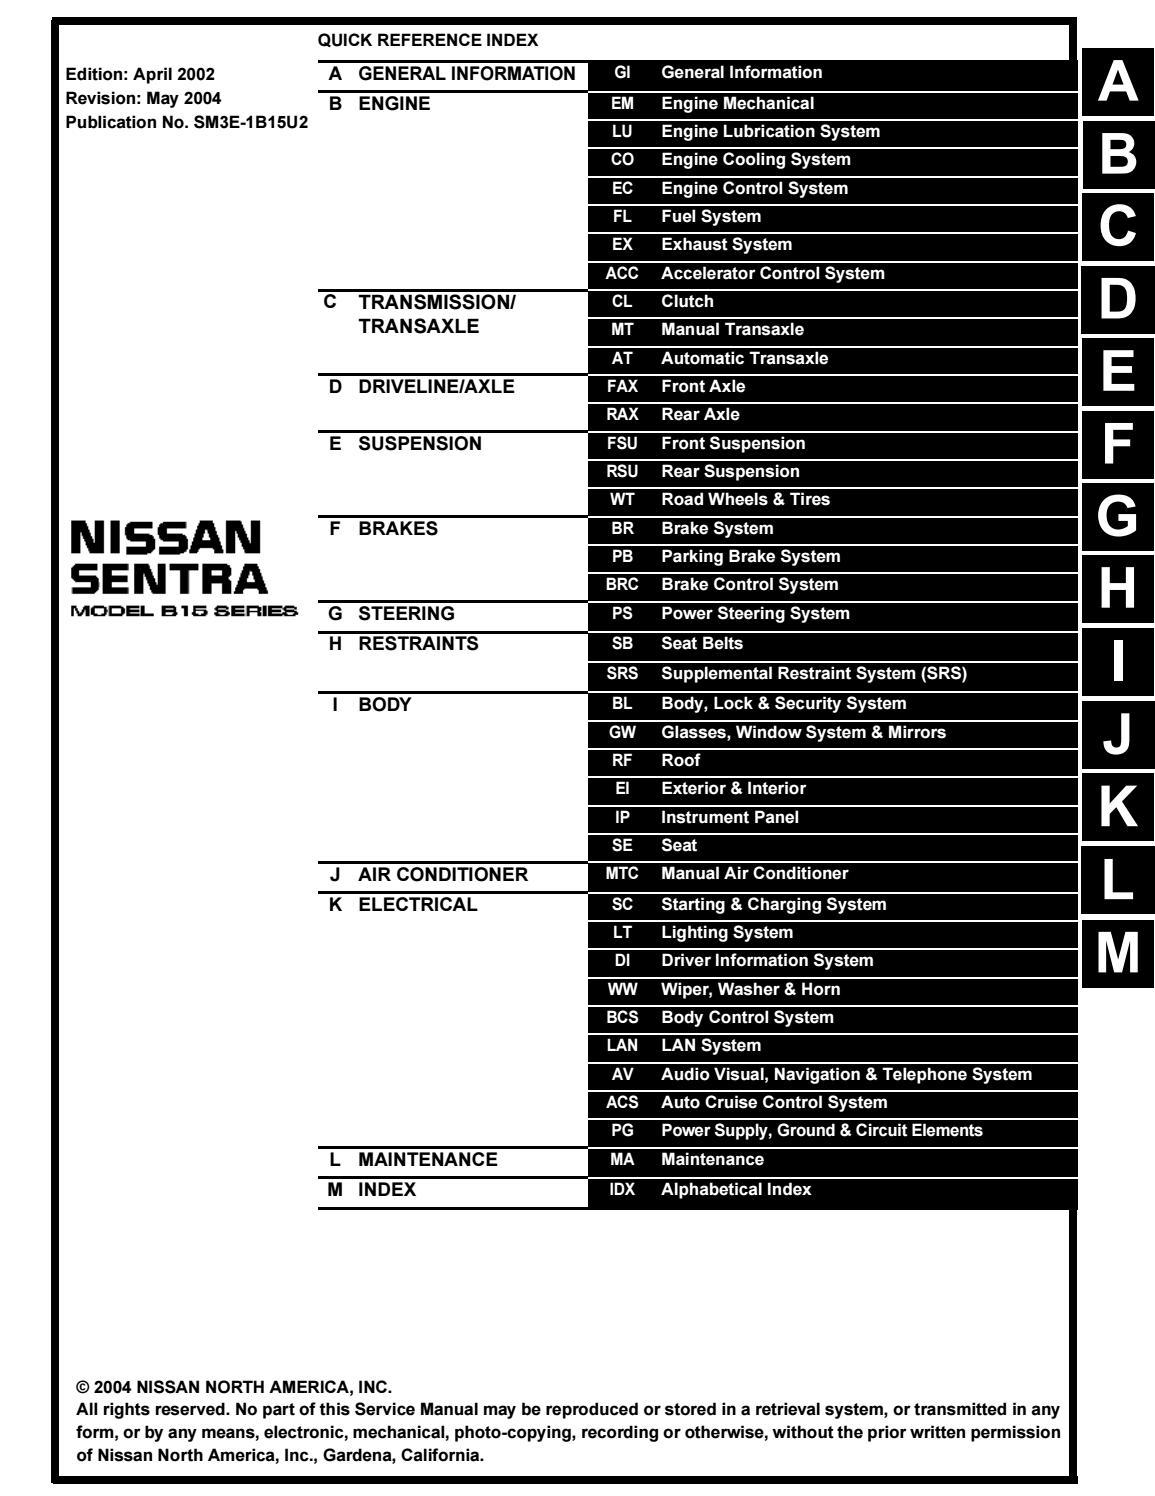 40 nissan sentra service repair manual by 40   issuu